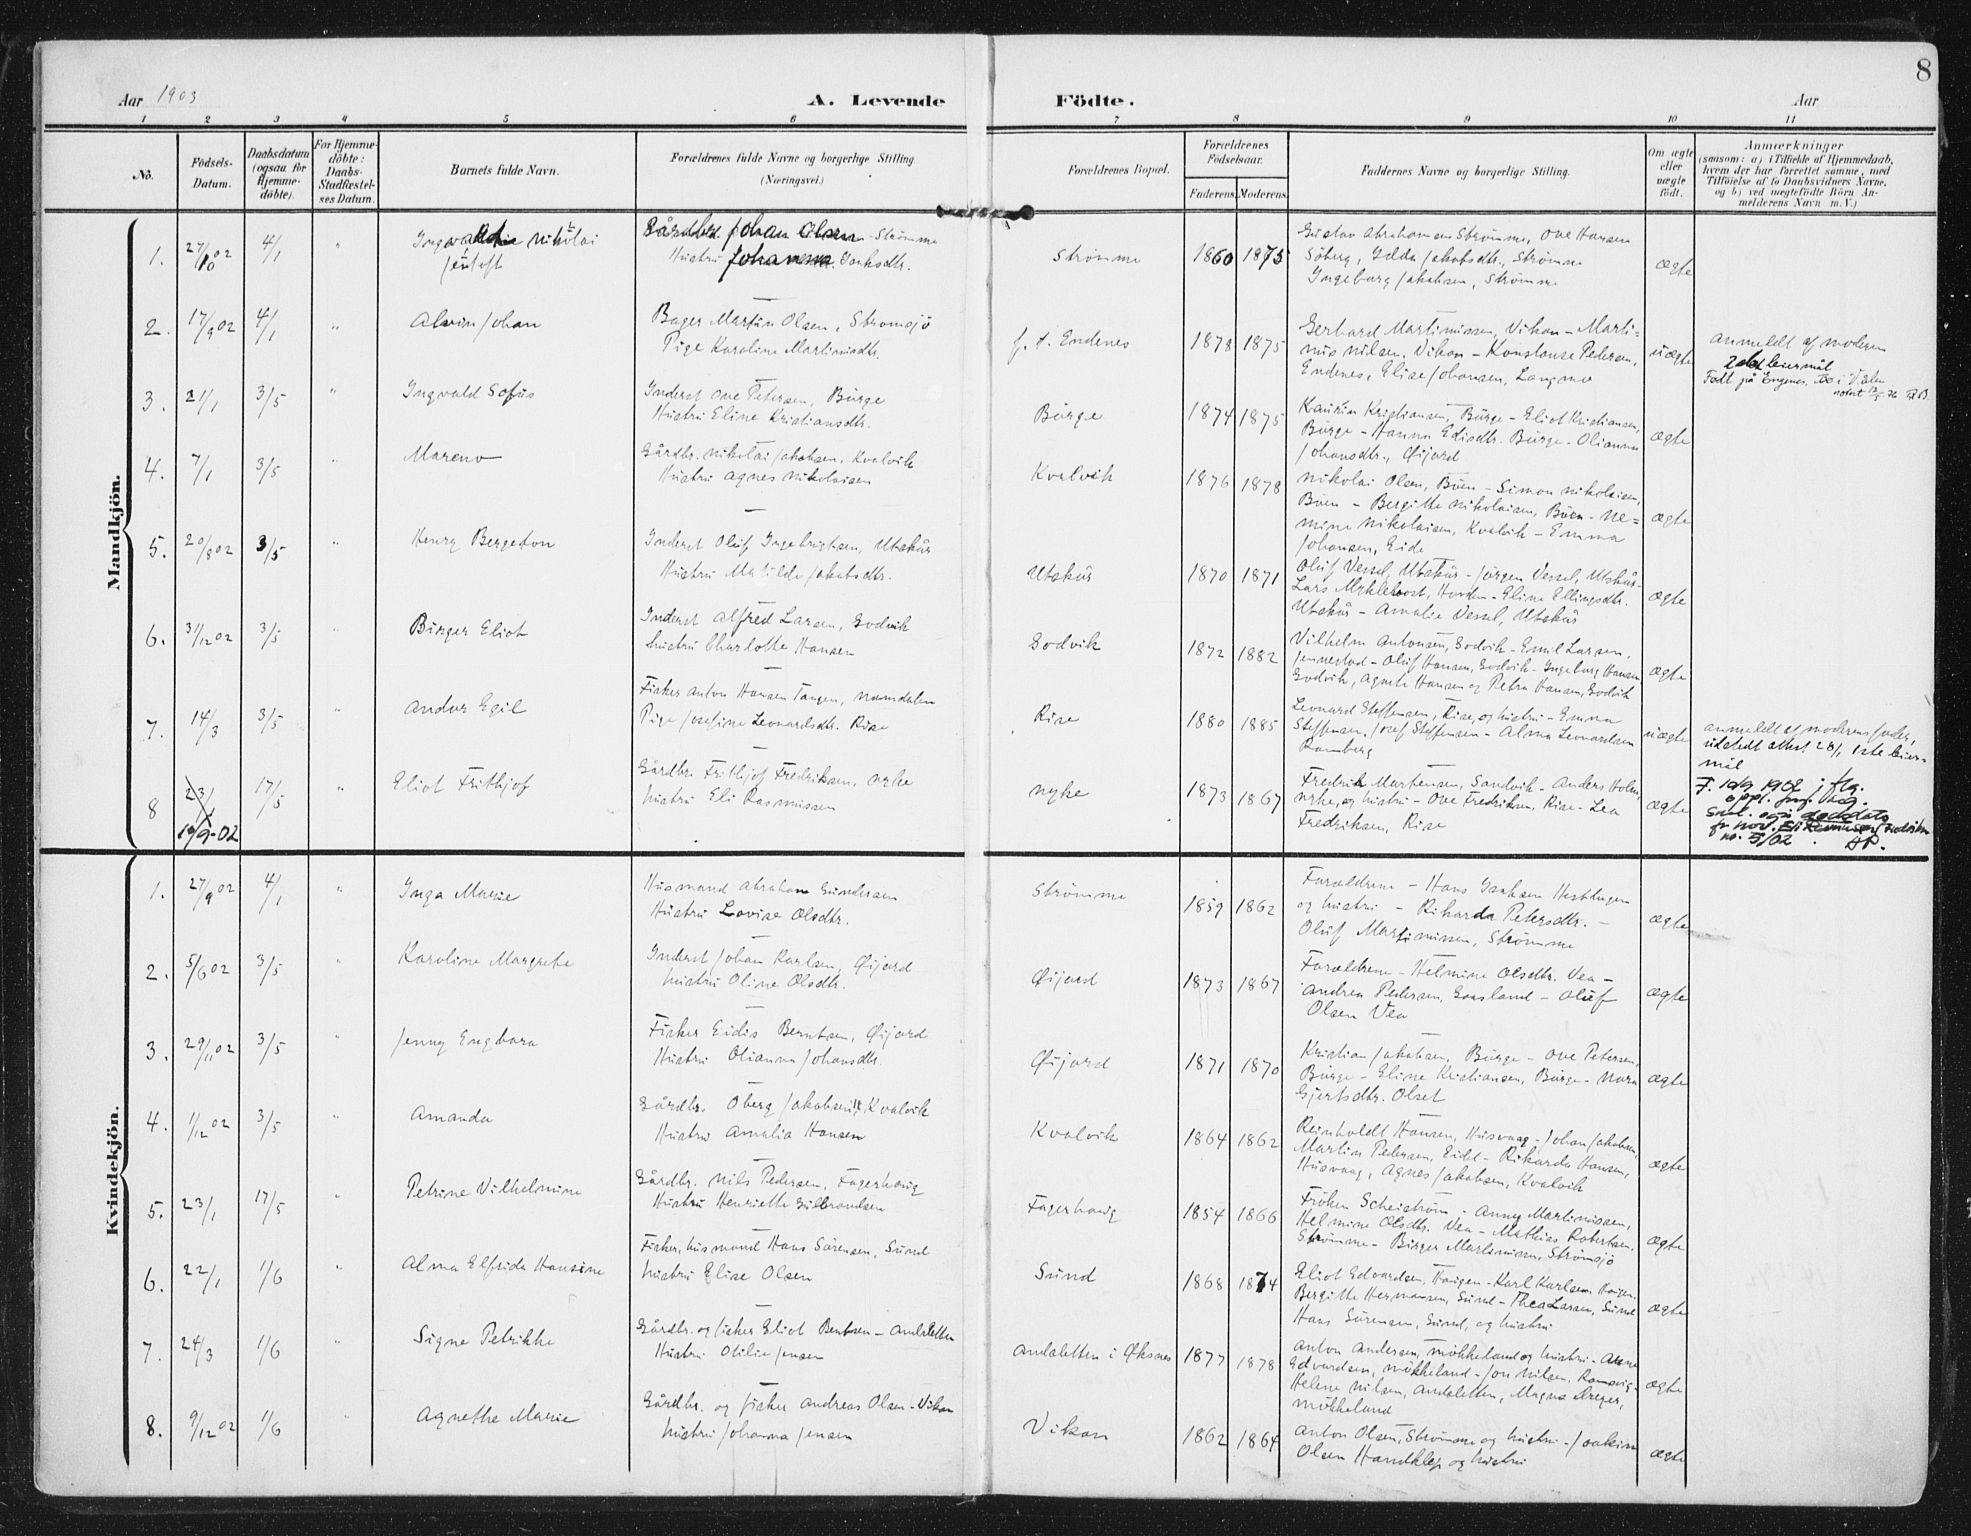 SAT, Ministerialprotokoller, klokkerbøker og fødselsregistre - Nordland, 892/L1321: Ministerialbok nr. 892A02, 1902-1918, s. 8